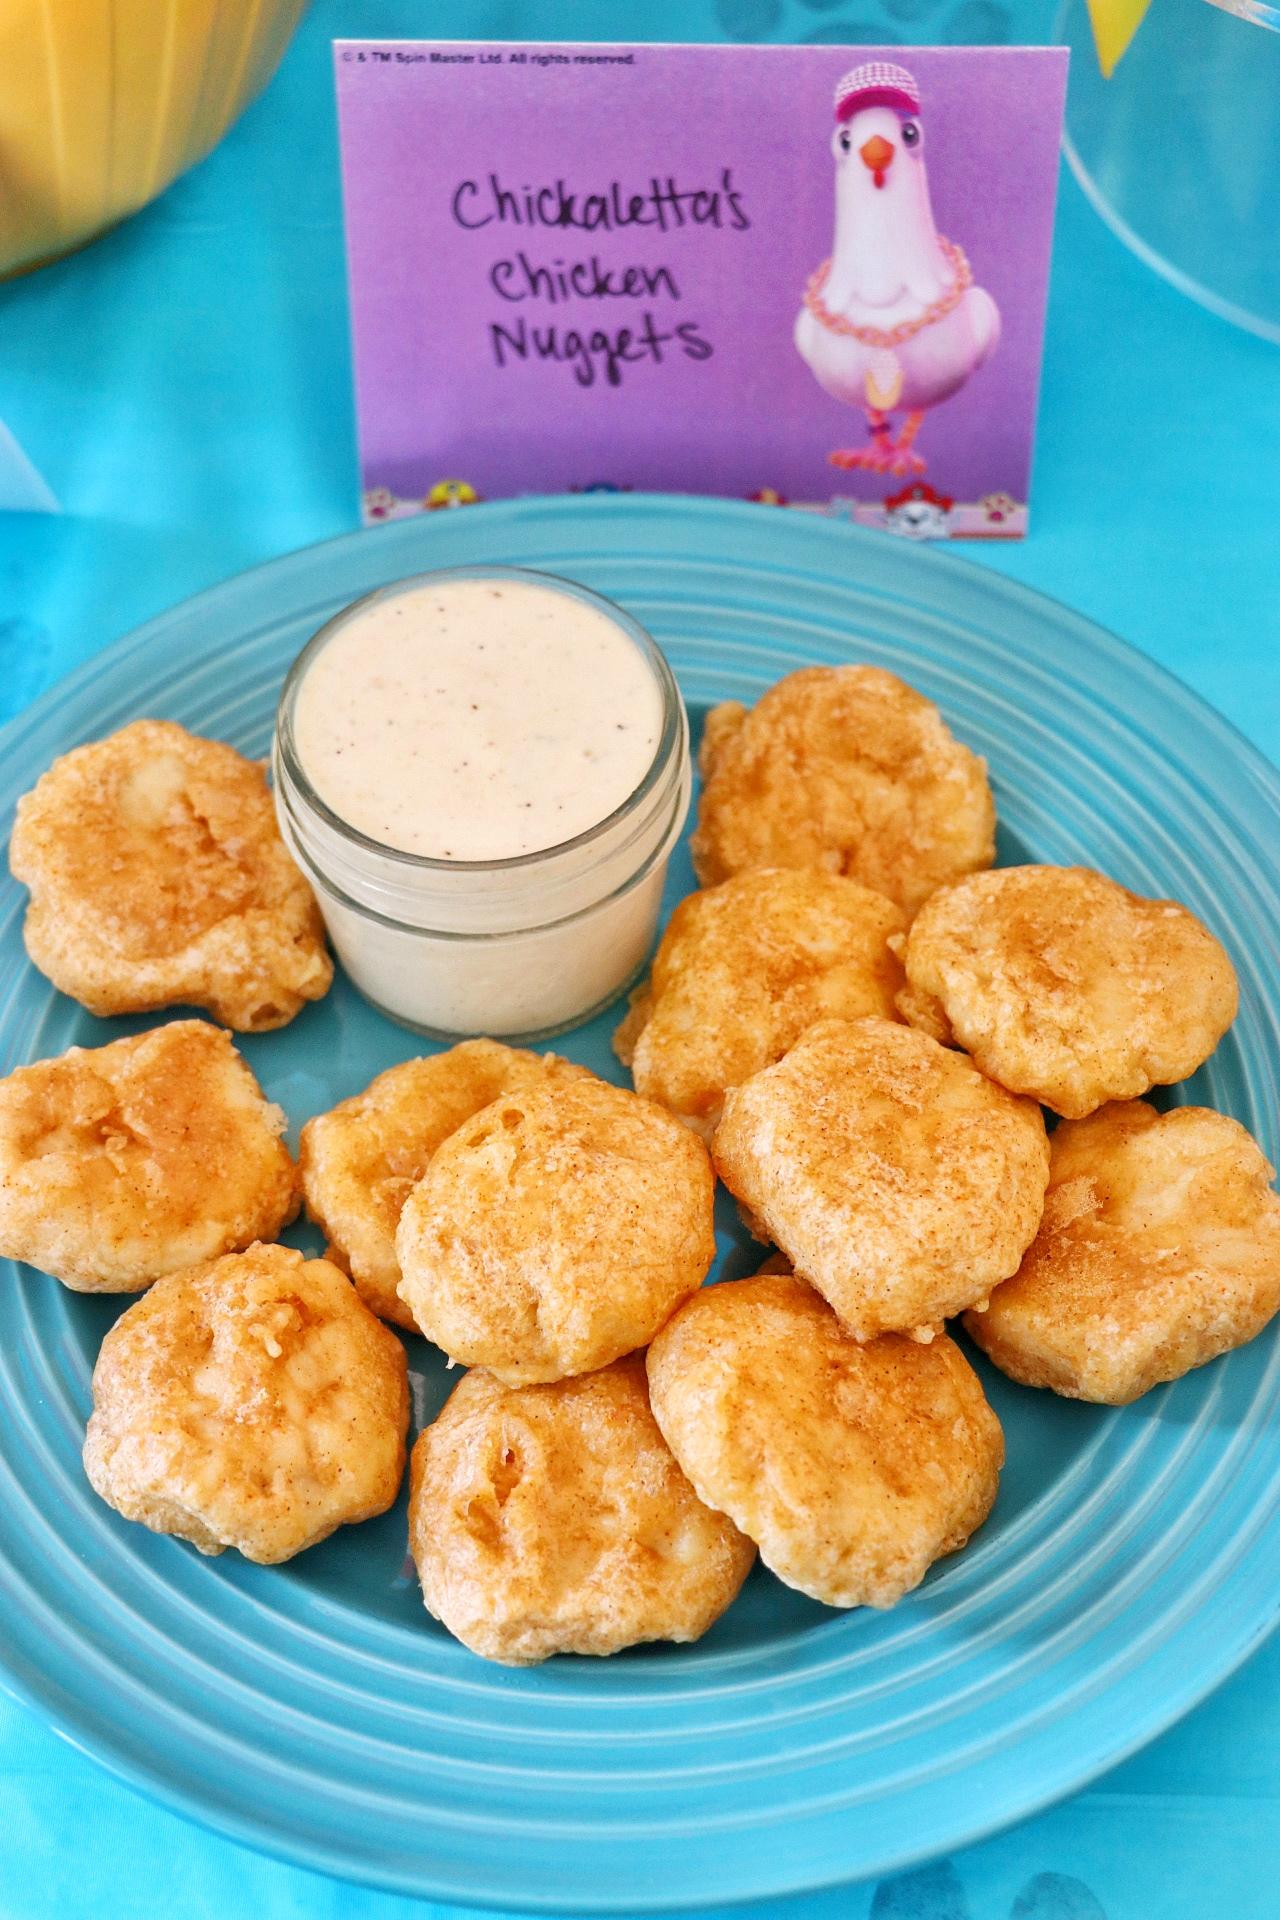 PAW Patrol snack ideas: Chickaletta's Chicken Nuggets